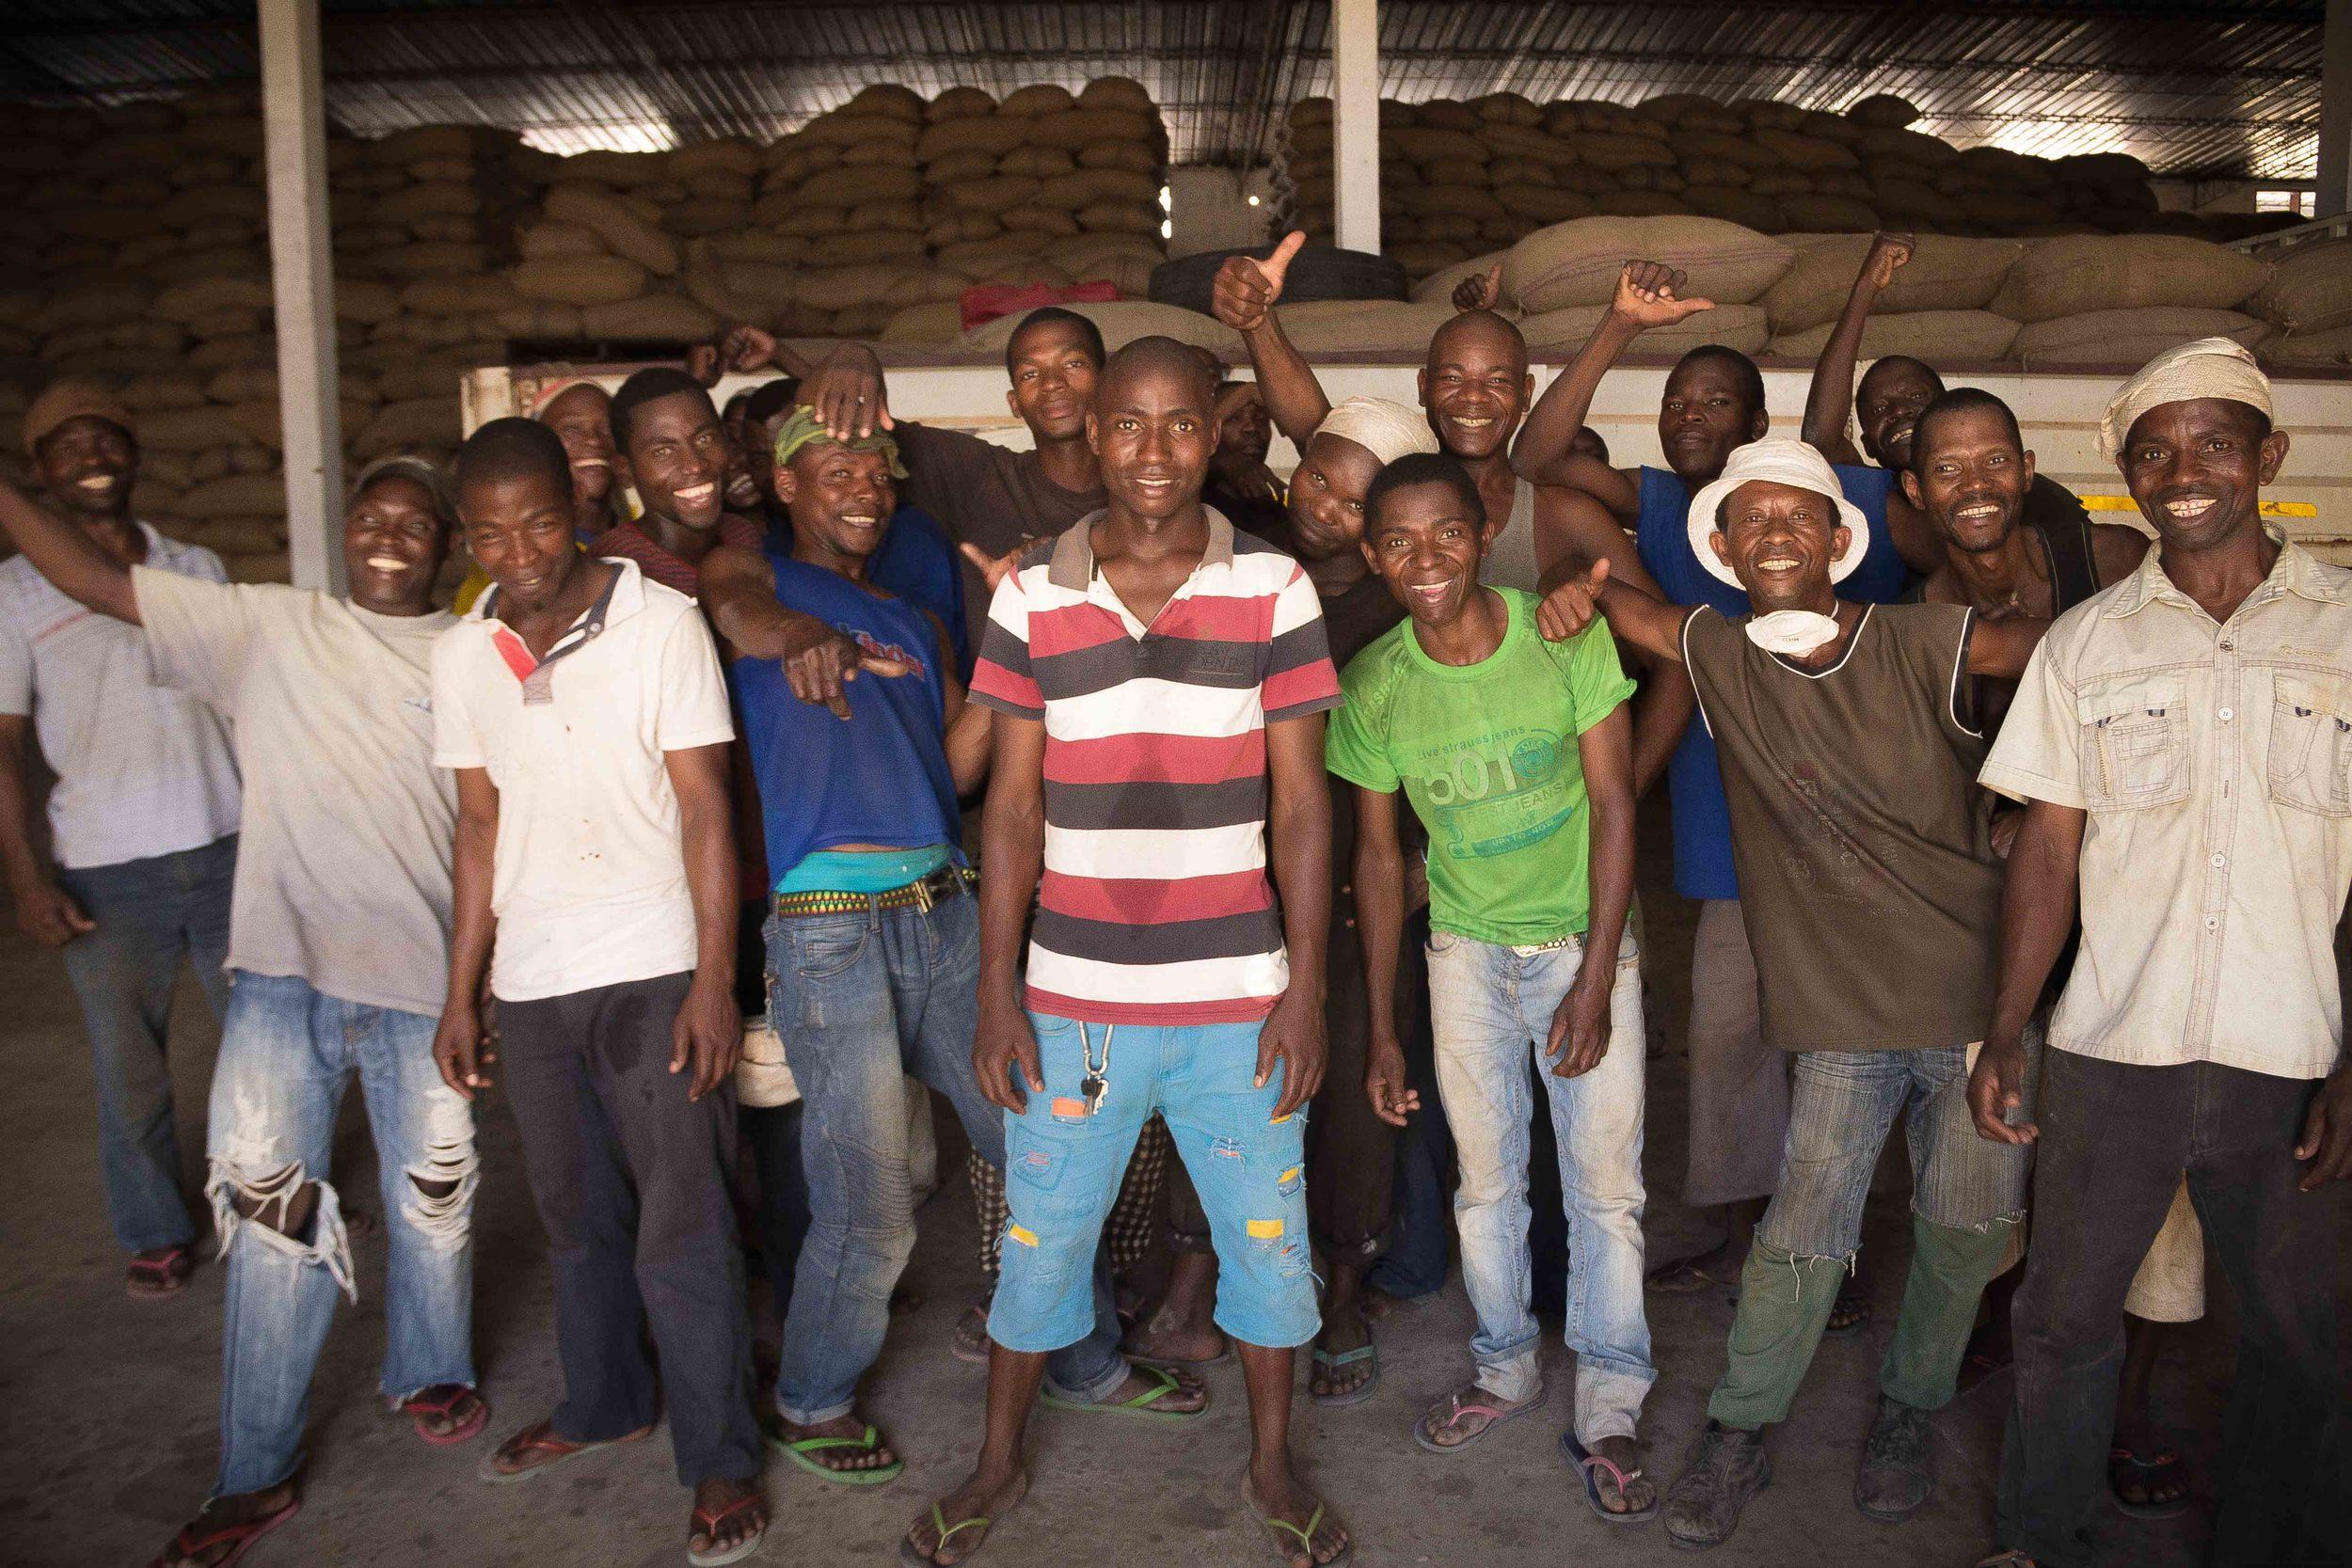 Anchilo district, Nampula province  – A group of workers in the warehouse at the Condor Nuts factory taking a break |  Um grupo de trabalhadores no armazém da fábrica da Condor Nuts